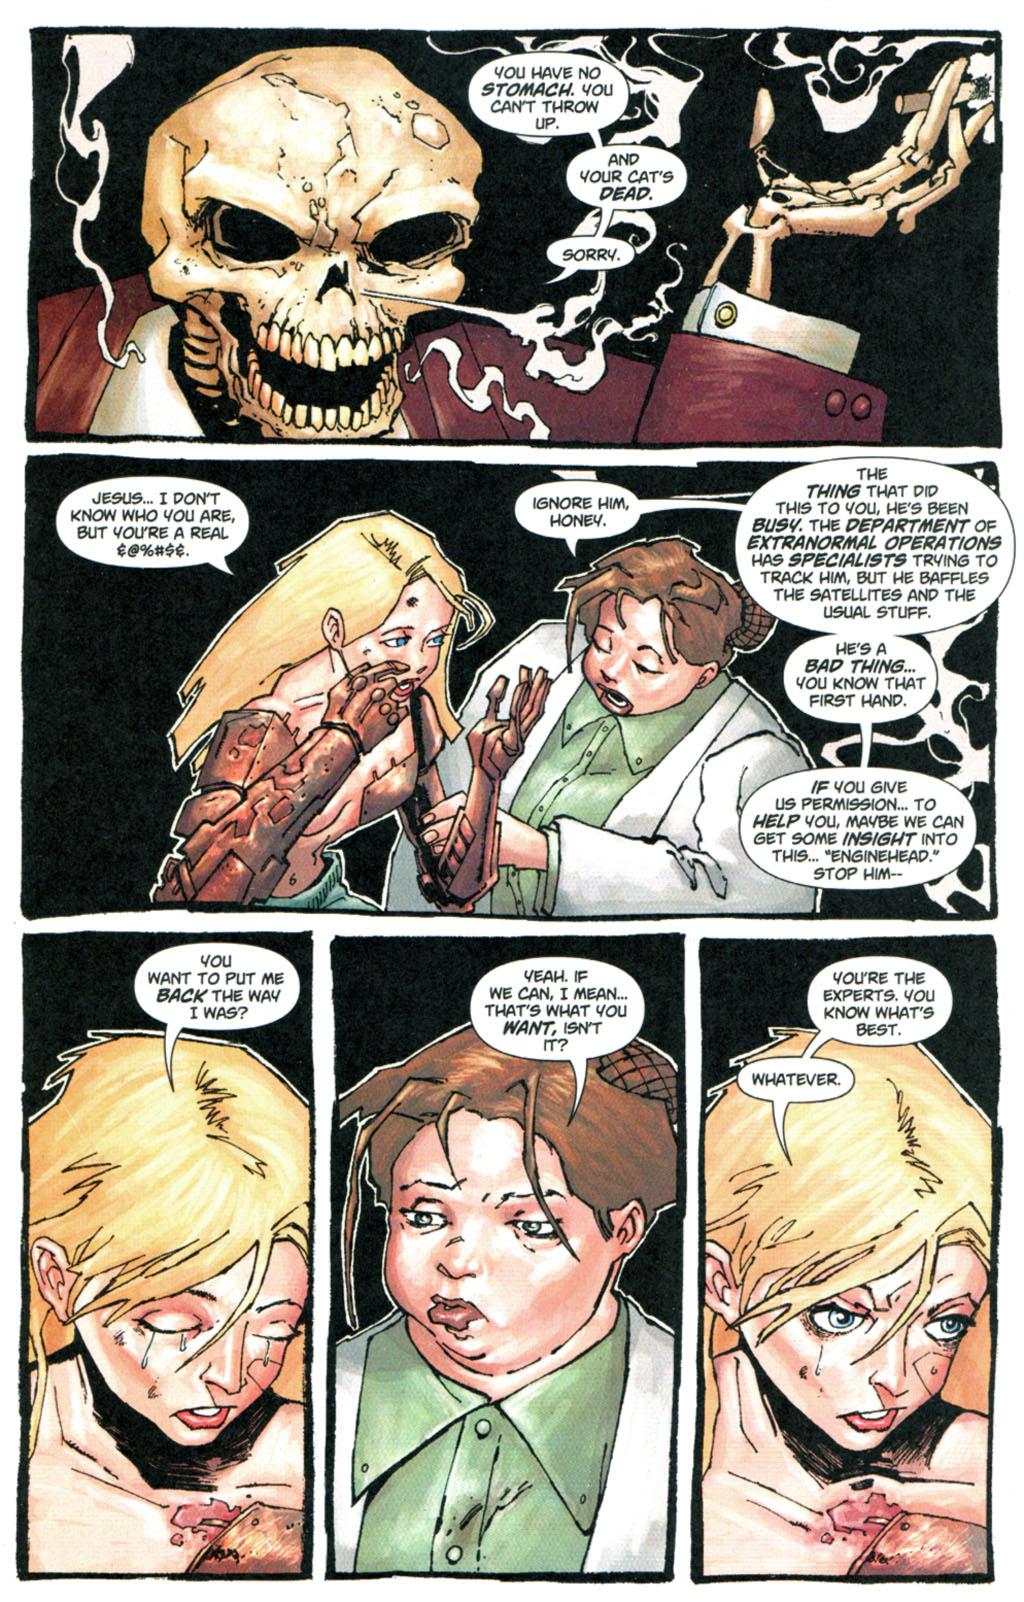 Read online Enginehead comic -  Issue #5 - 7